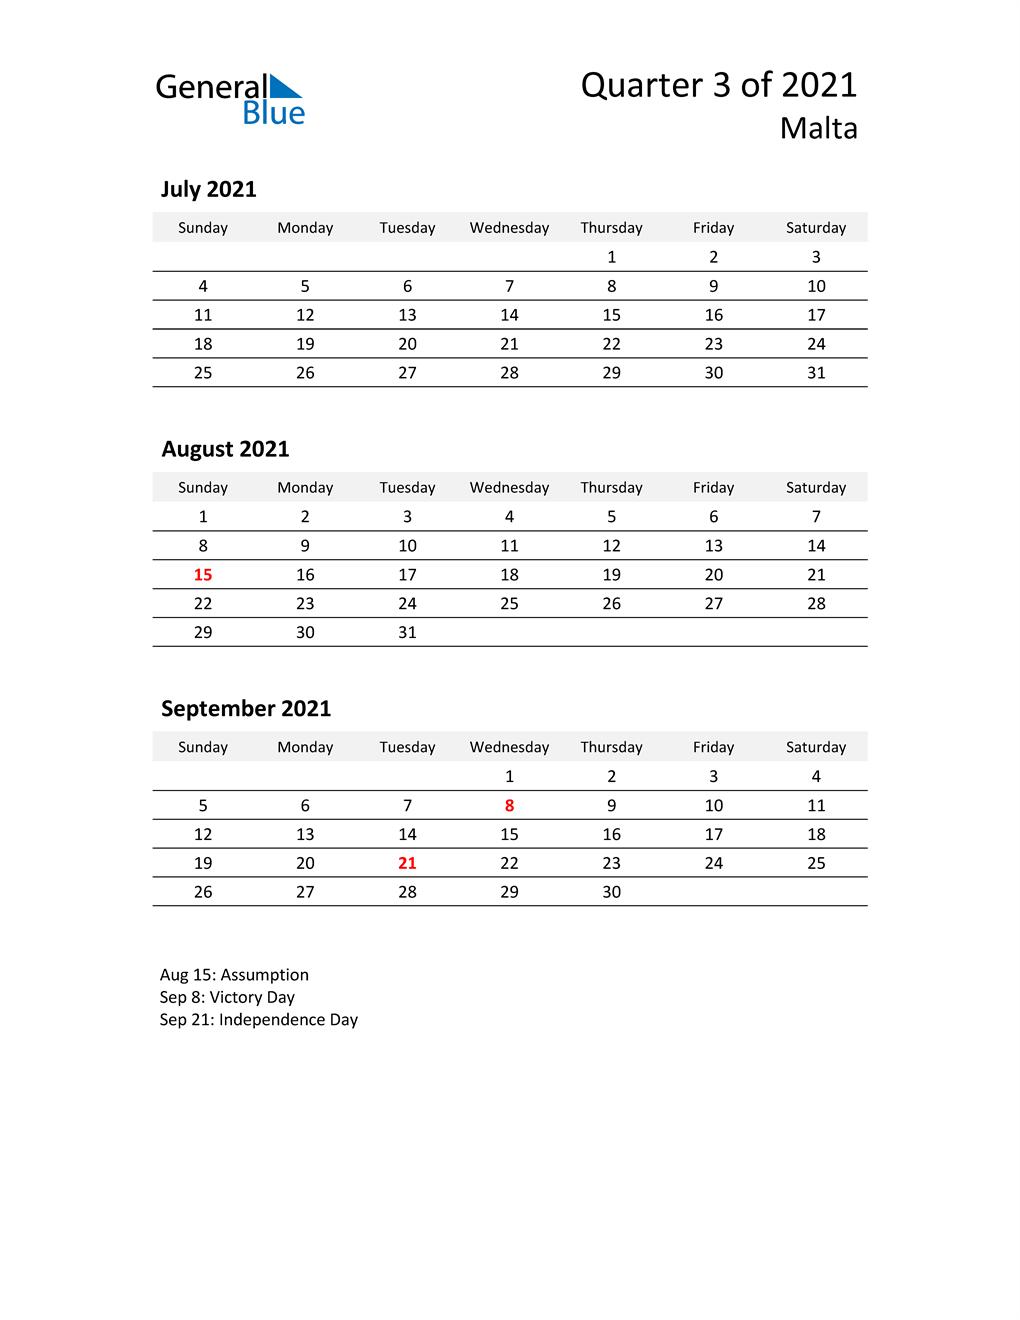 2021 Three-Month Calendar for Malta